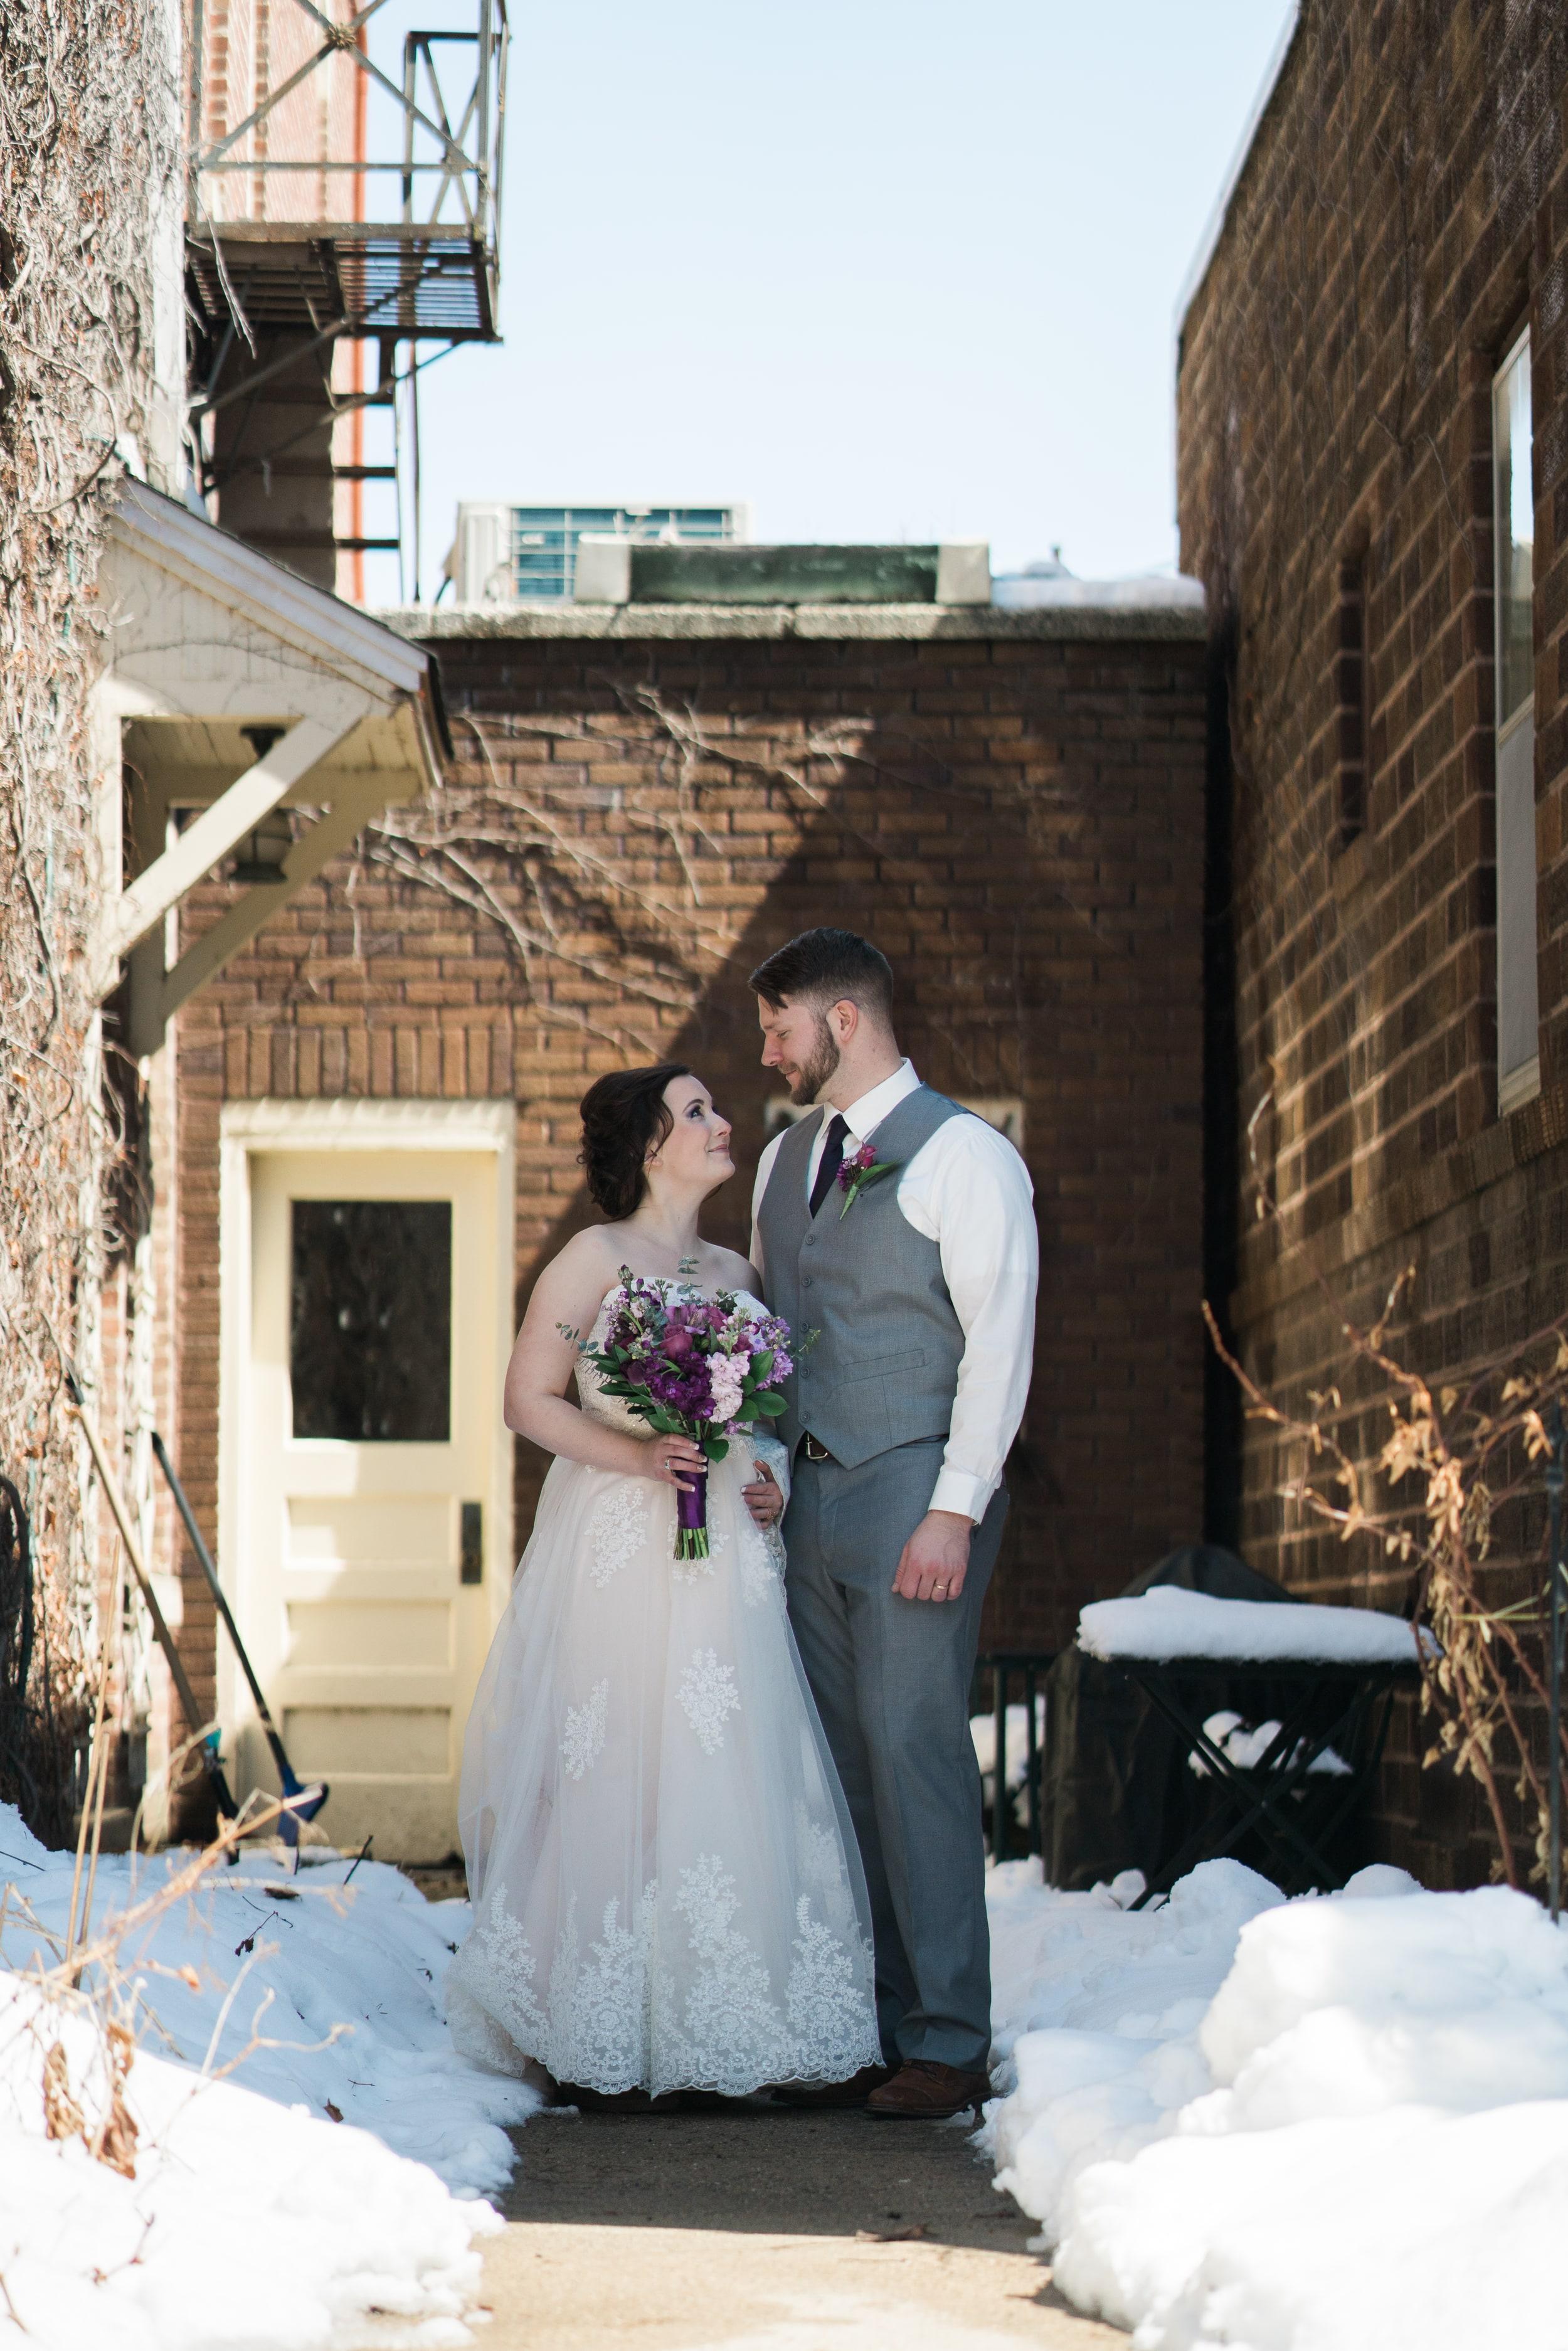 snowy-intimate-wedding-13.jpg